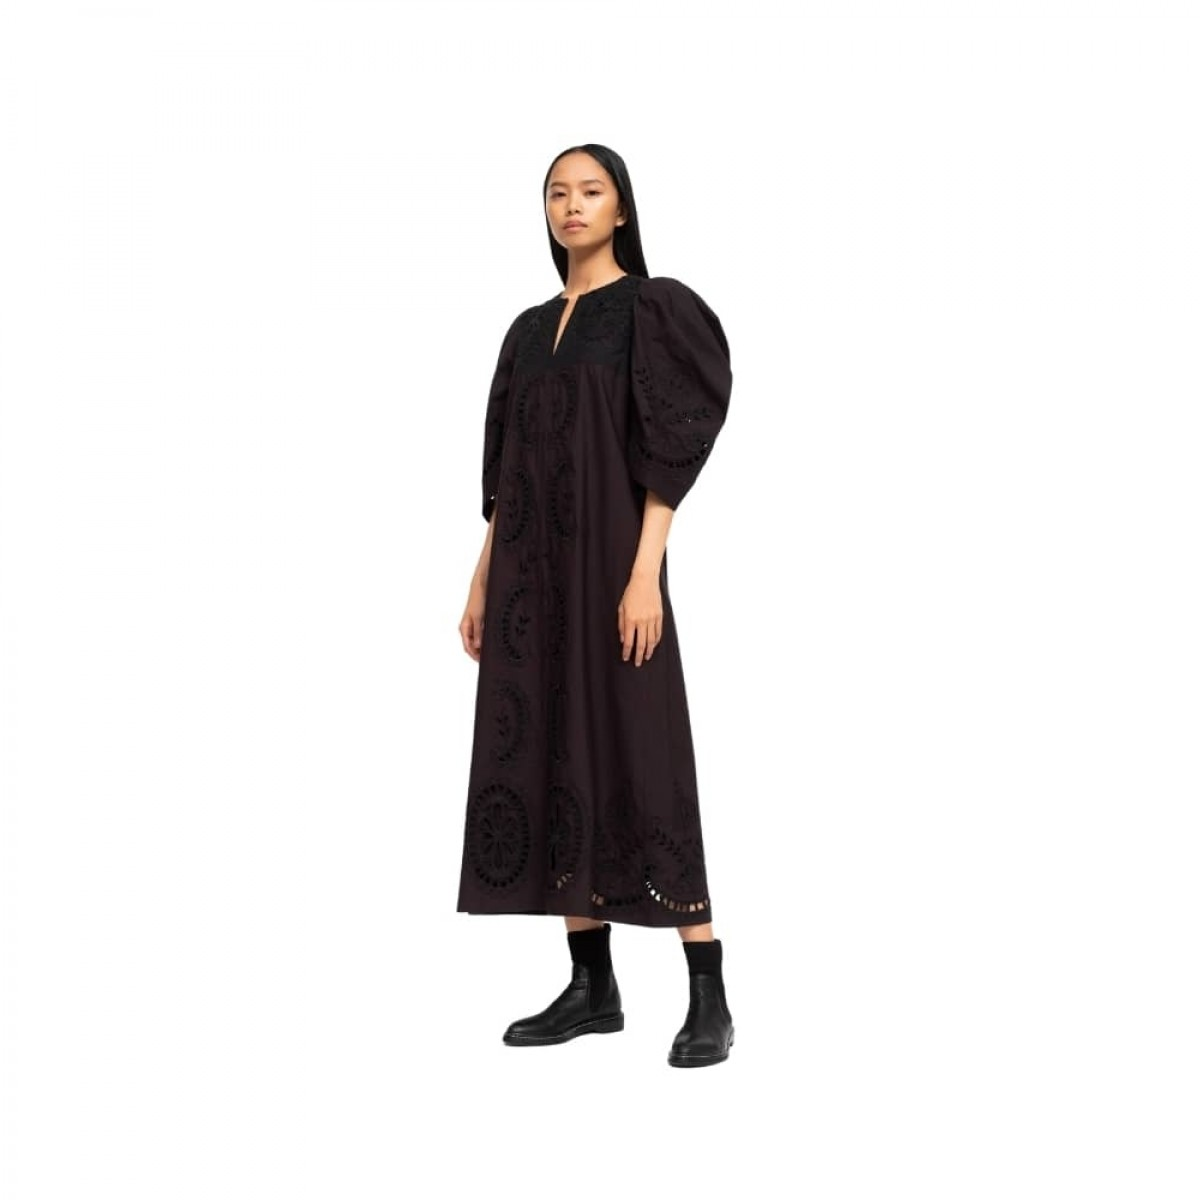 santos eyelet dress - black - model 1